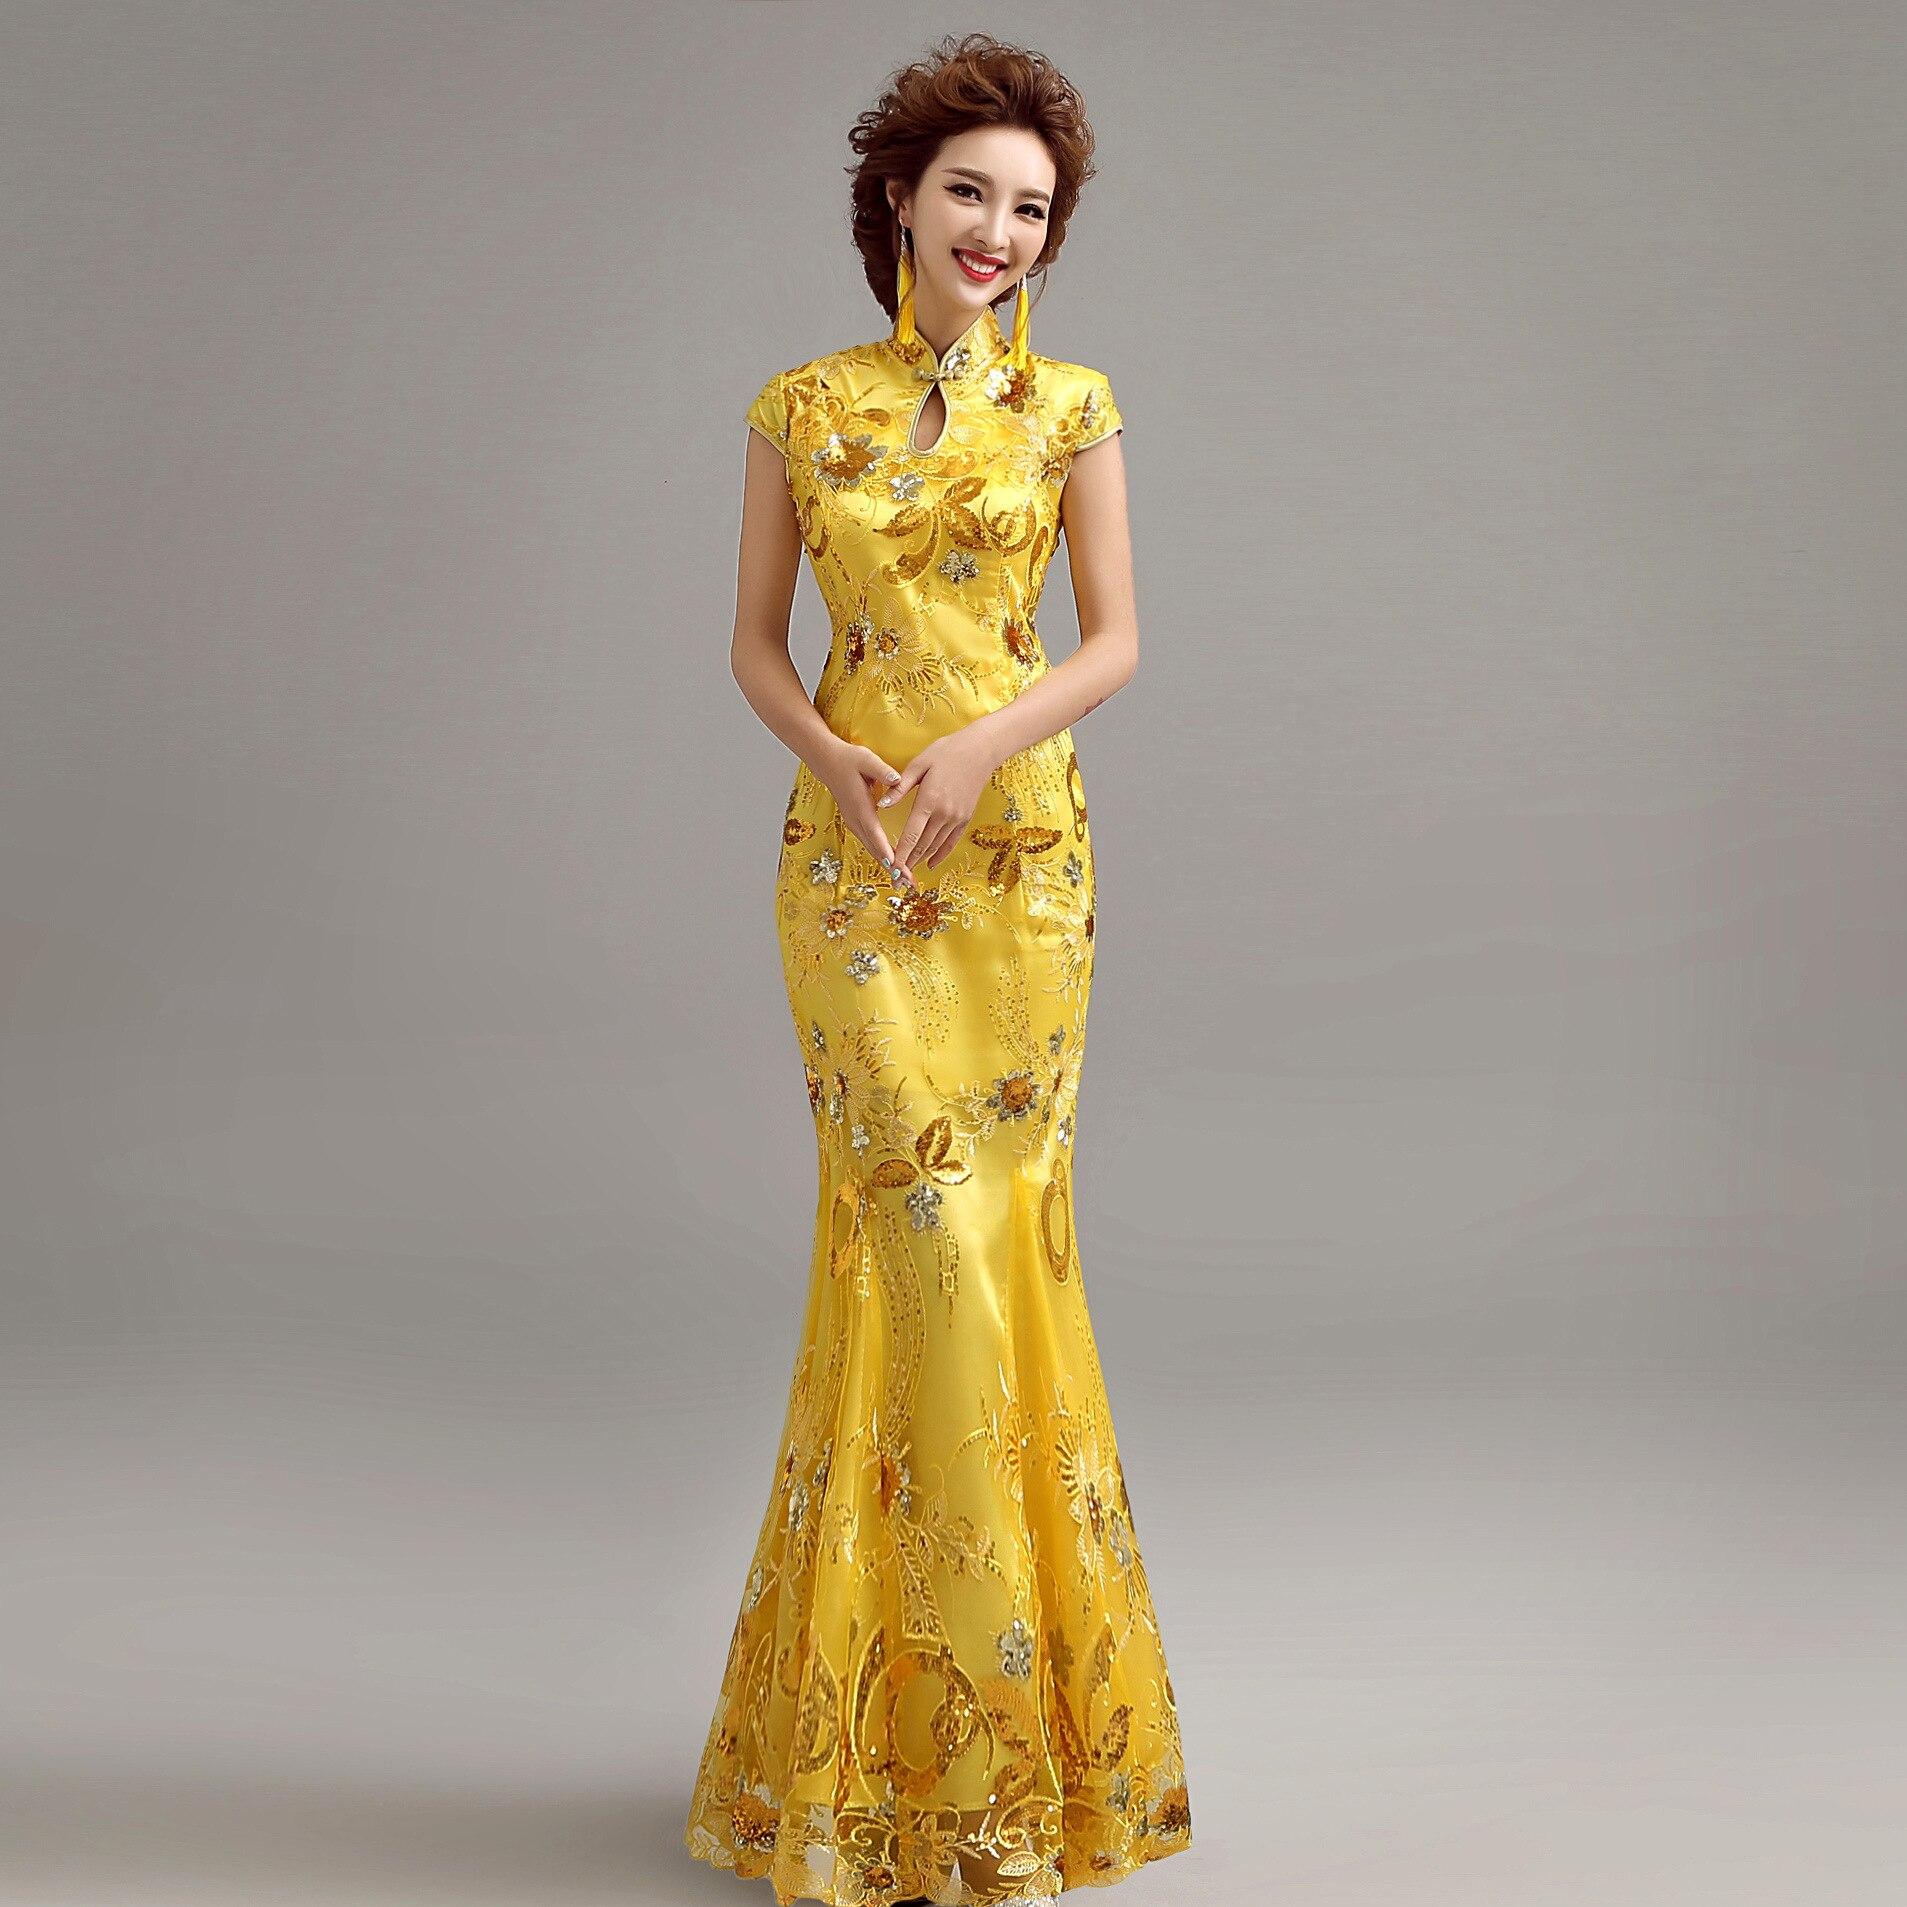 Yellow embroidered wedding dresswedding dressesdressesss yellow embroidered wedding dress ombrellifo Images